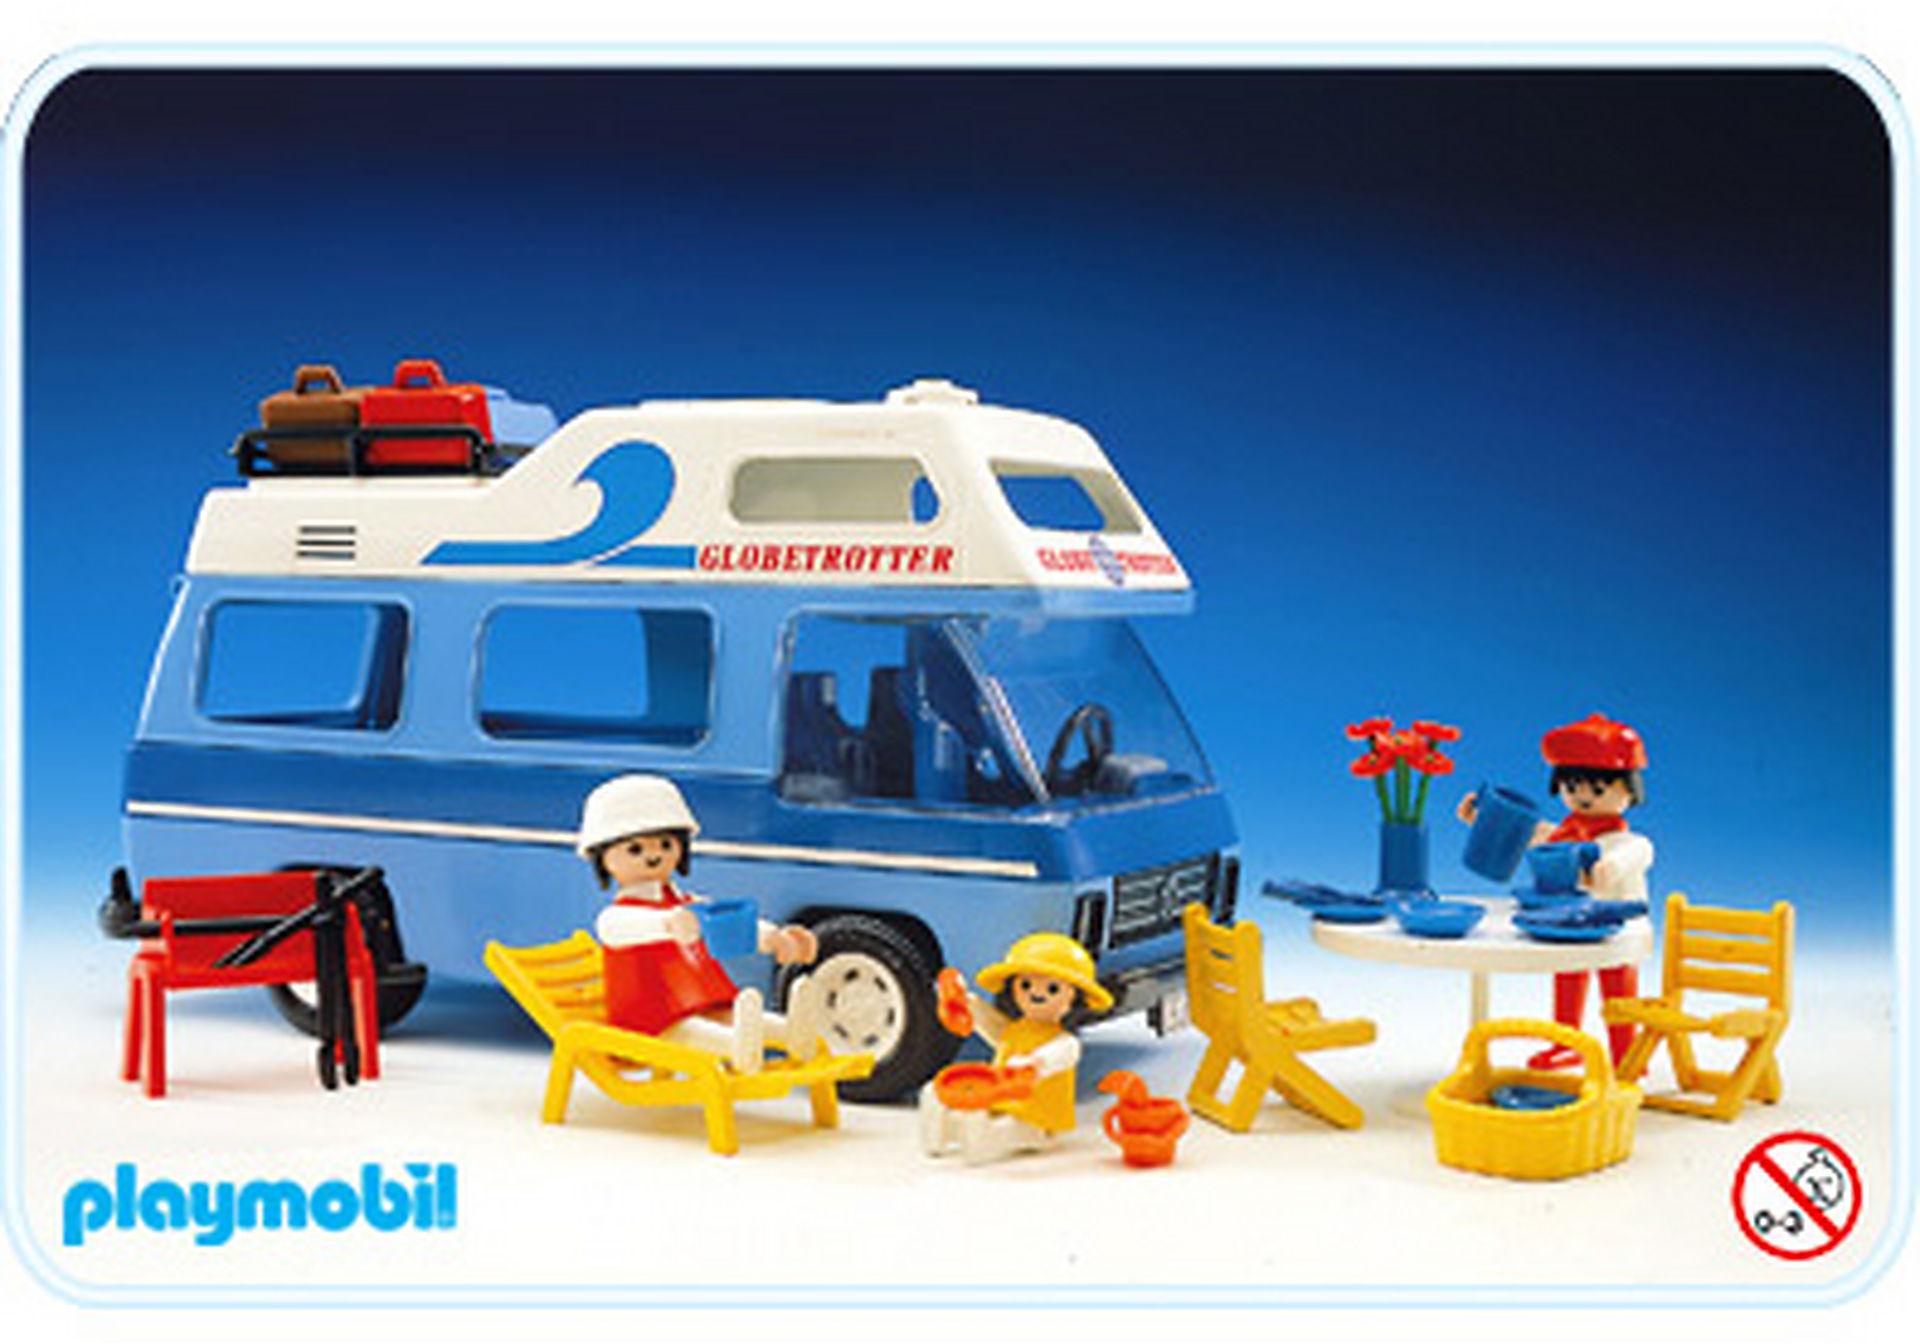 http://media.playmobil.com/i/playmobil/3258-B_product_detail/Camping-car